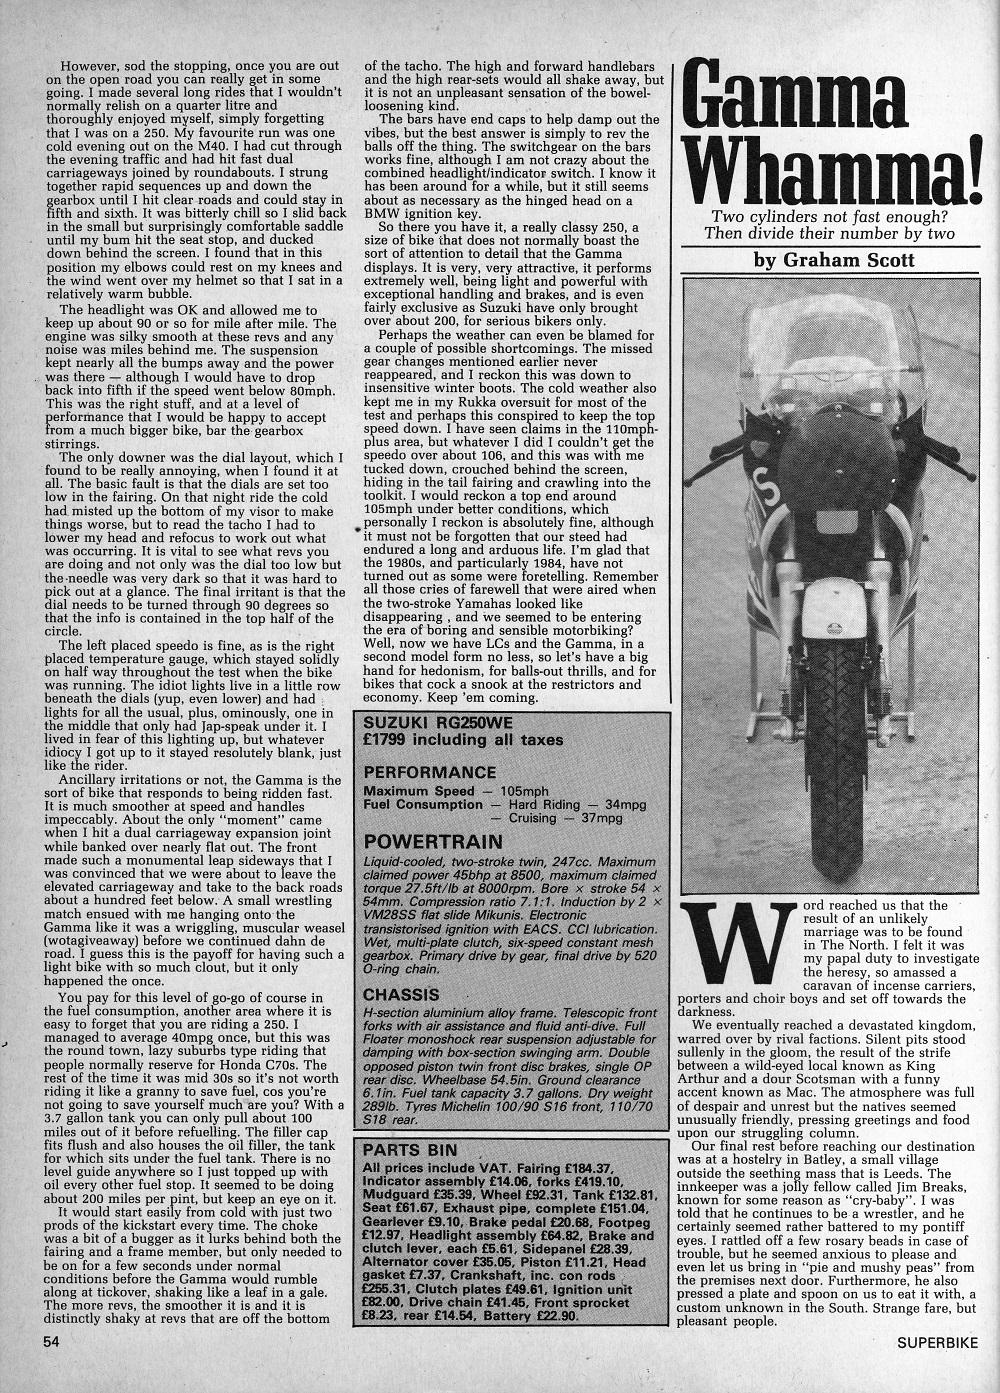 1985 Suzuki RG250 Gamma road test.4.jpg